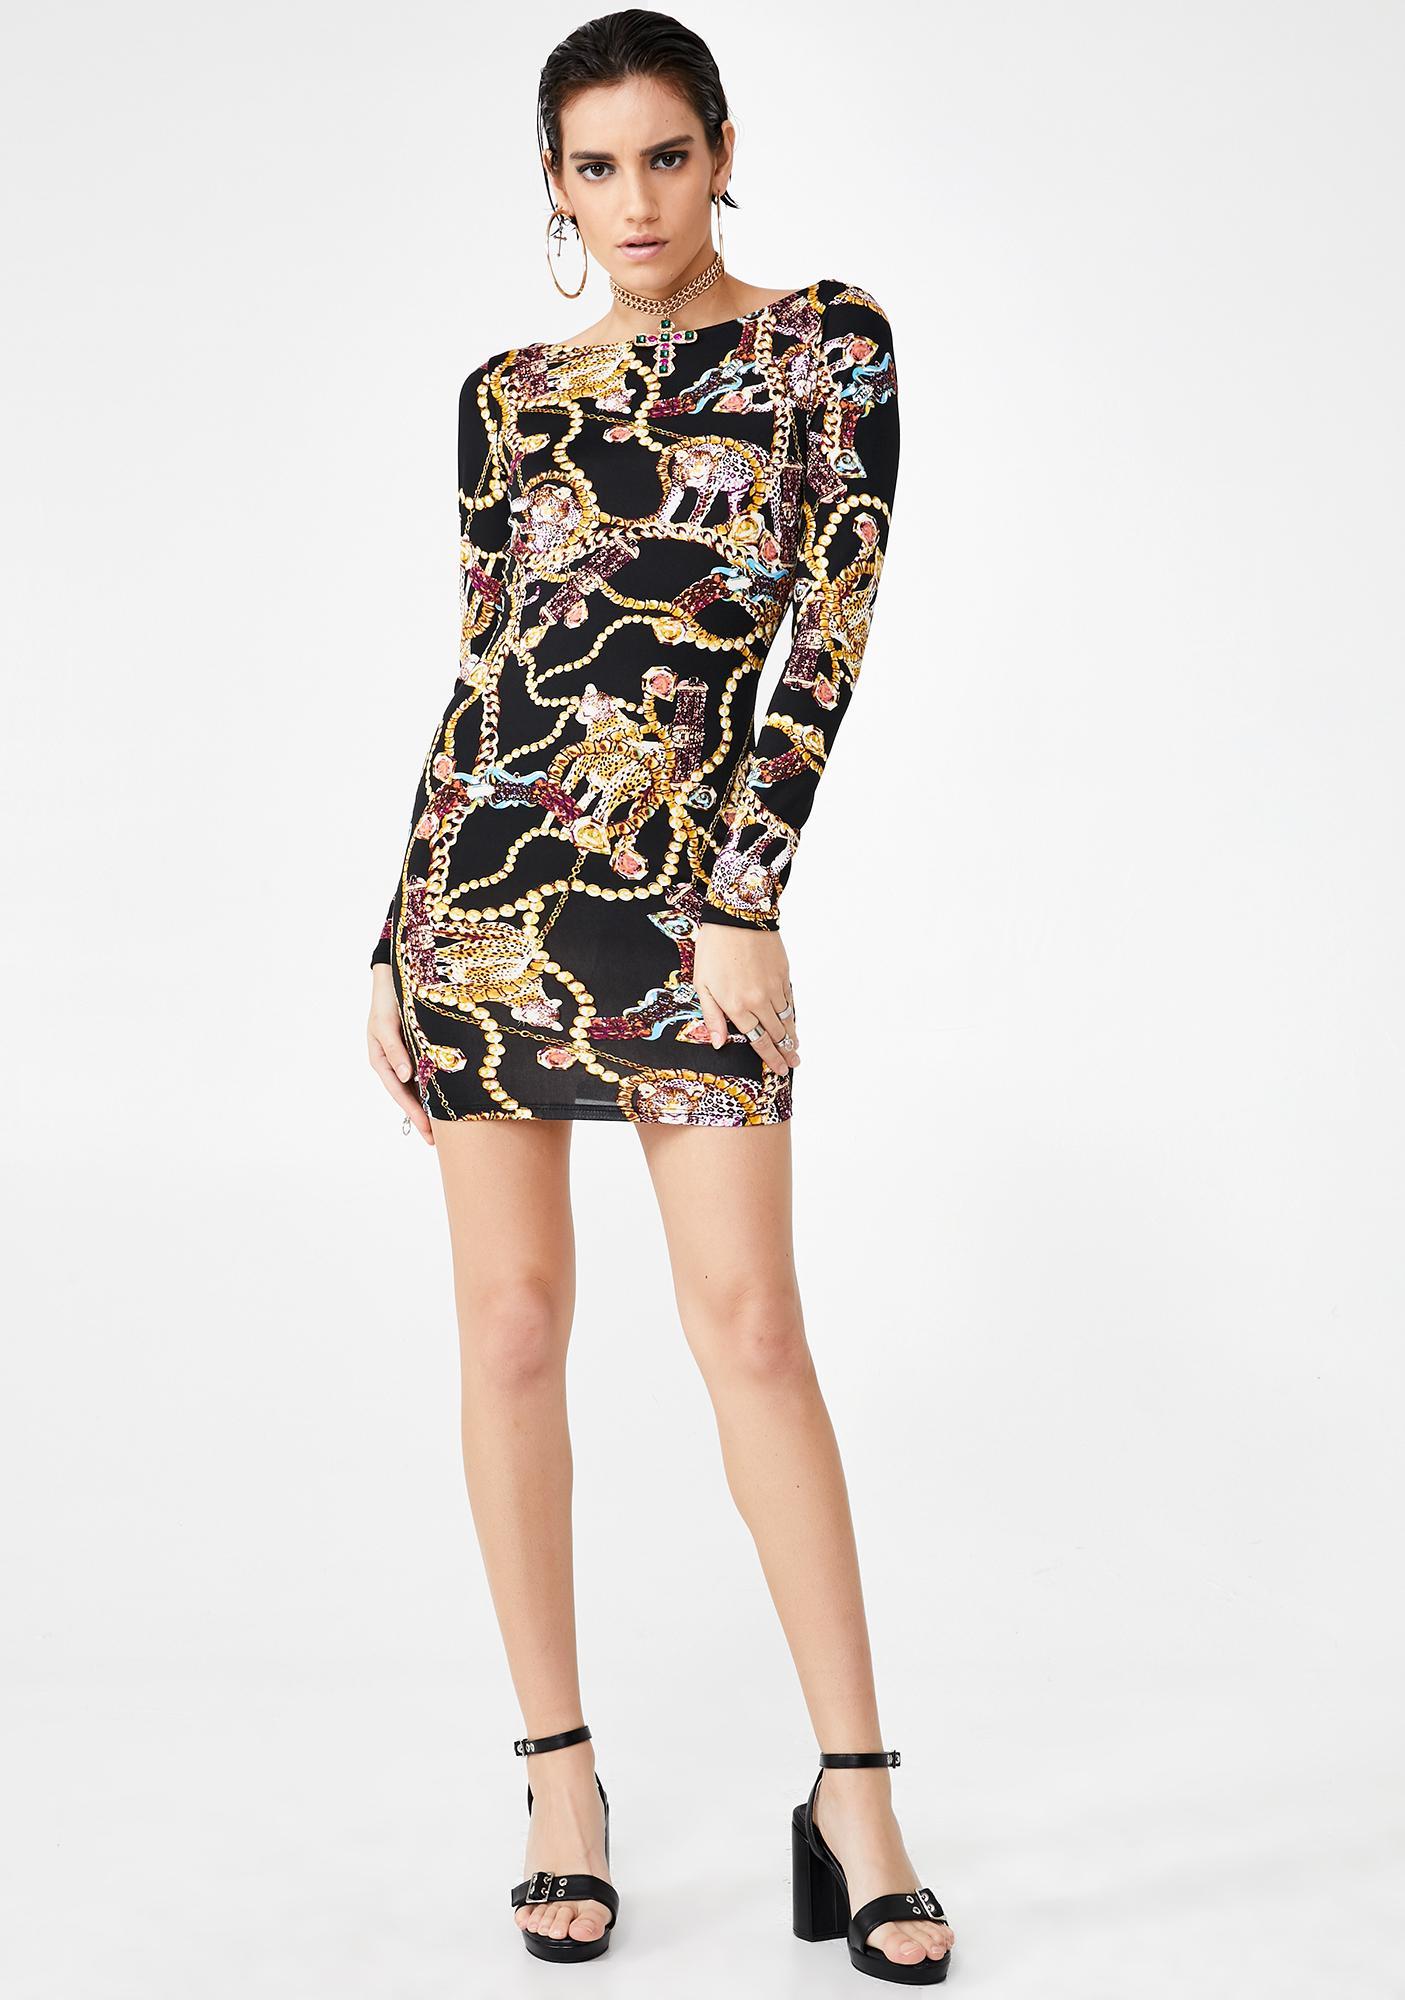 No Fakes Bodycon Dress